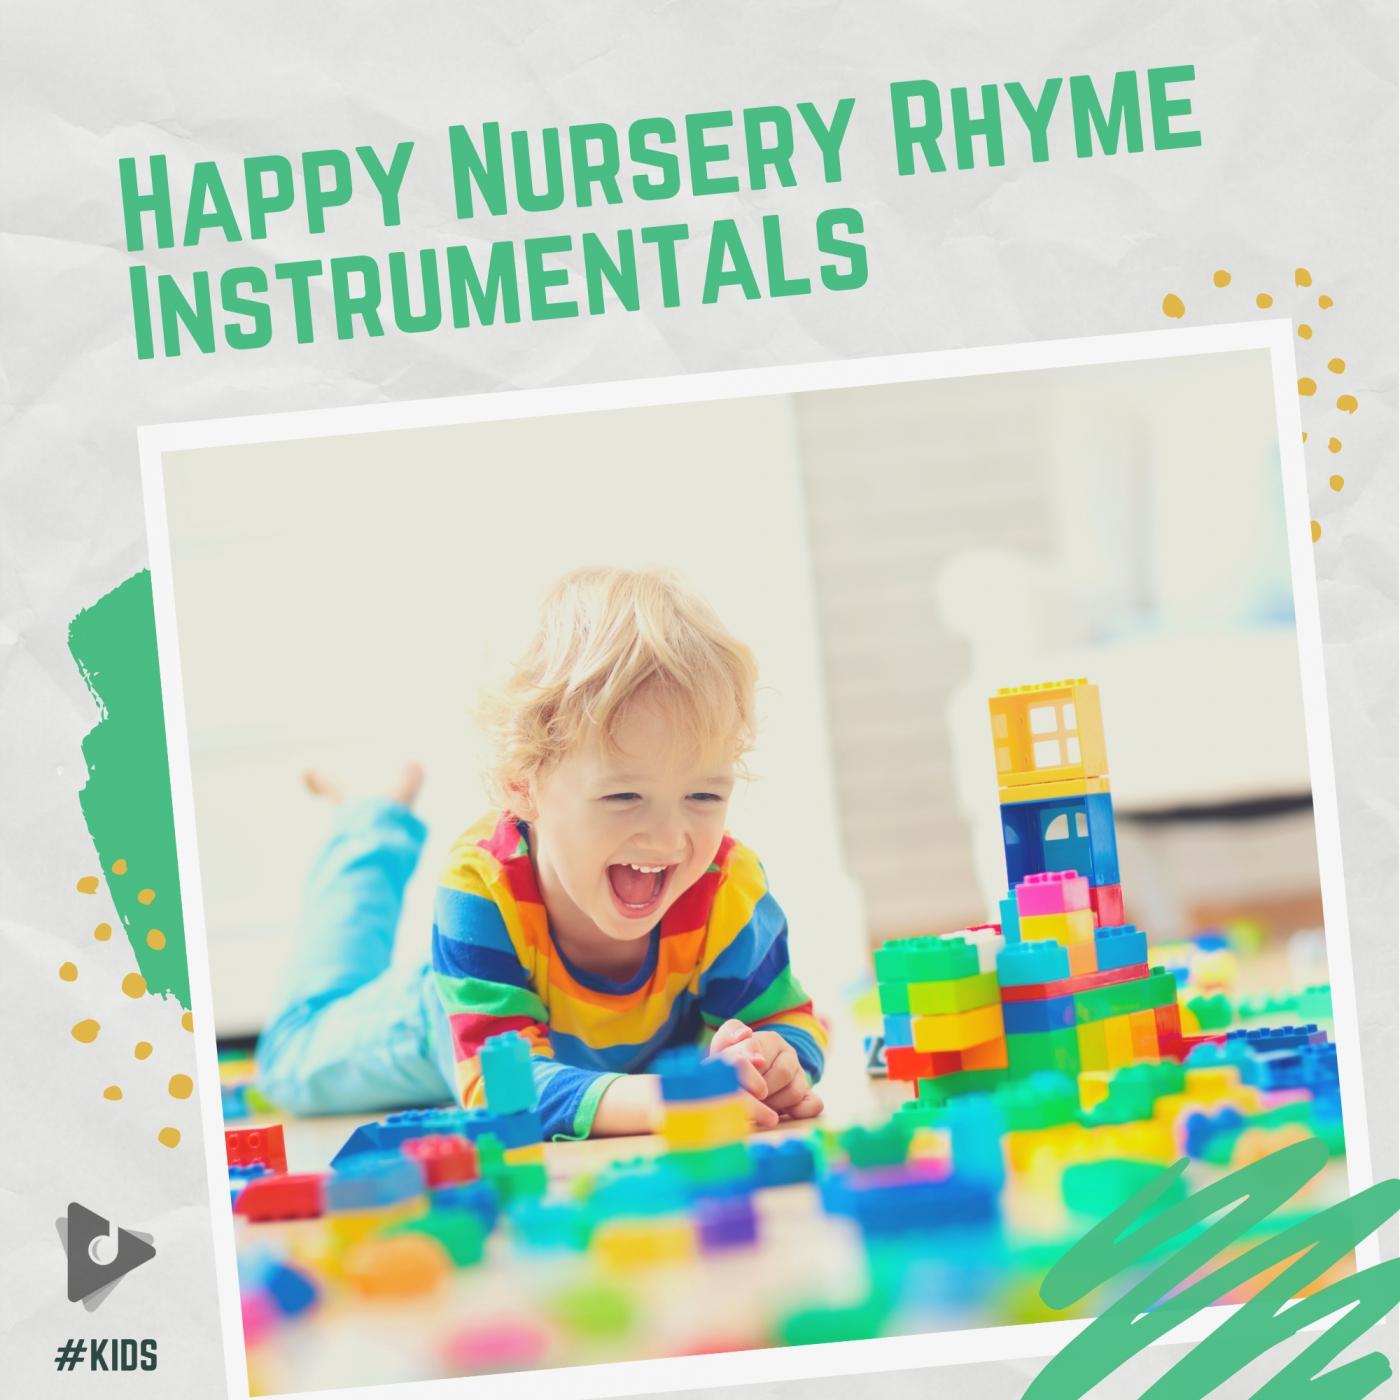 Happy Nursery Rhyme Instrumentals